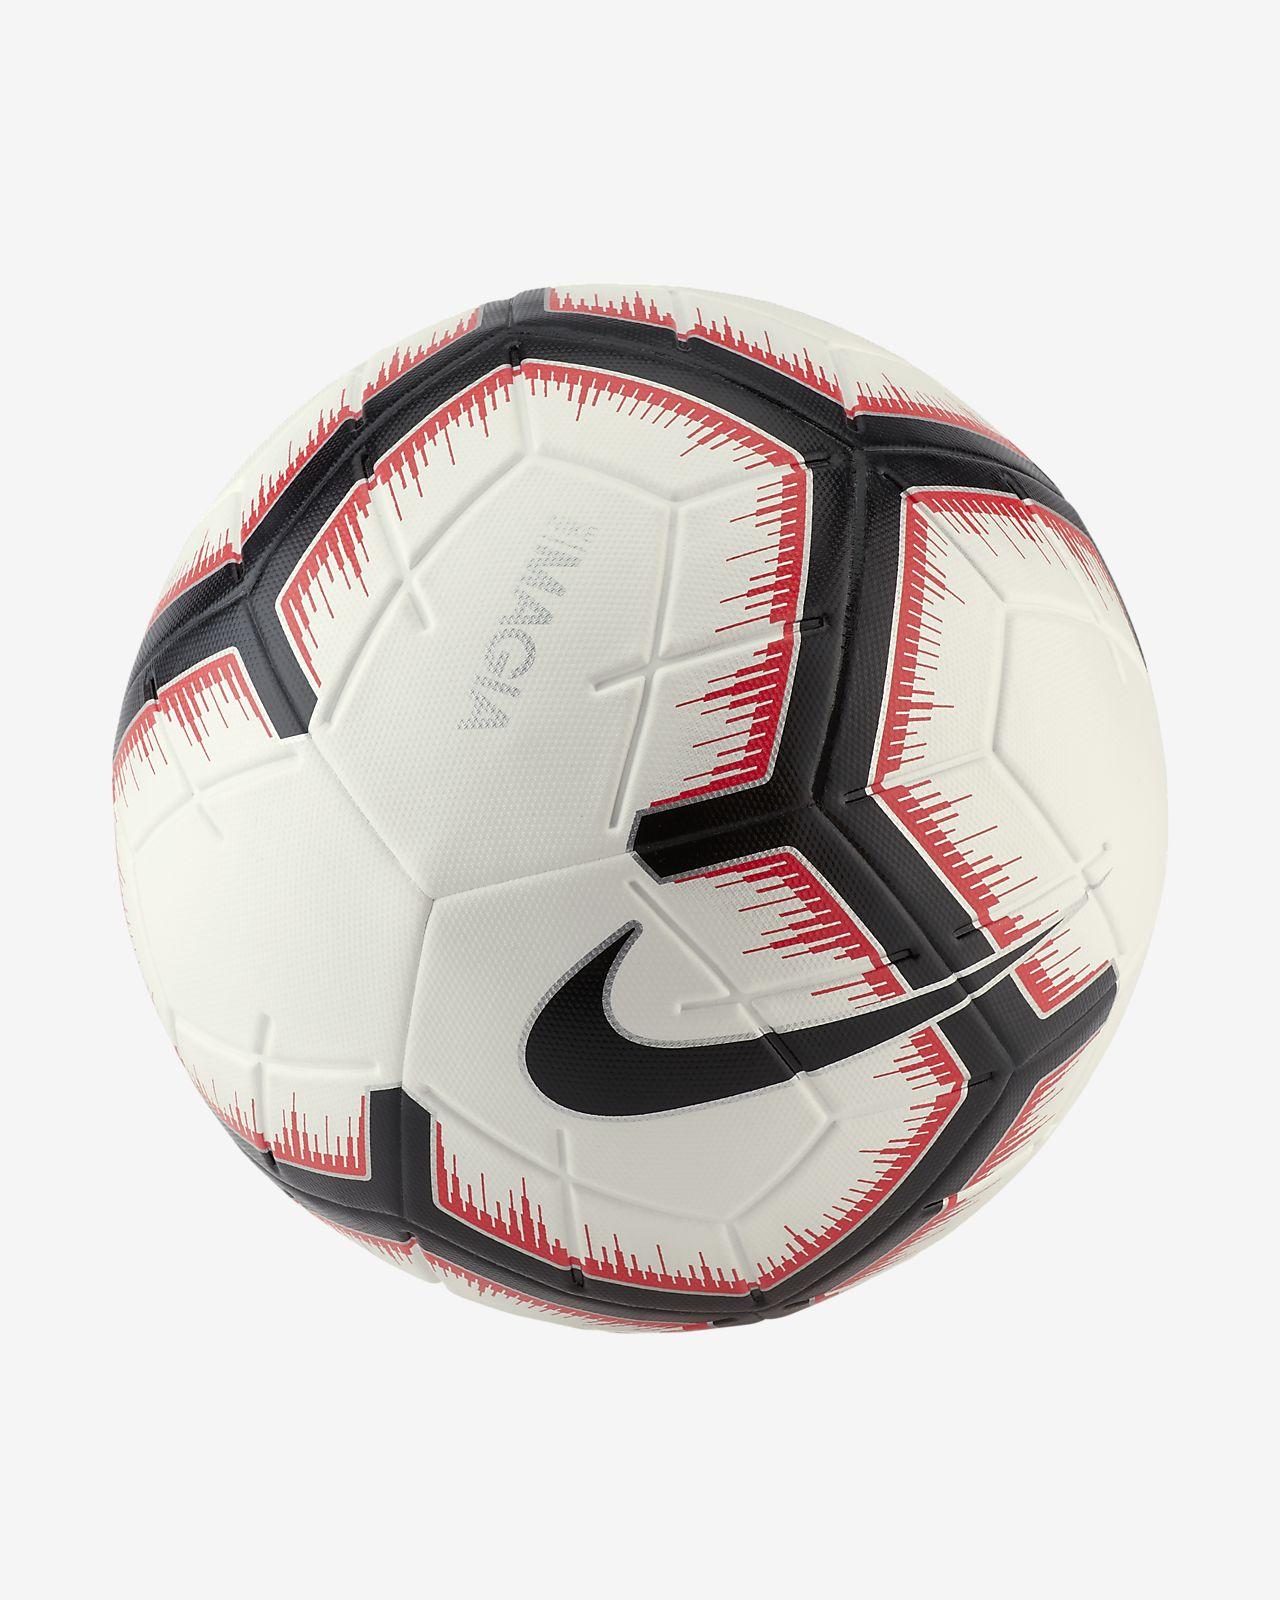 Nike Magia Futbol Topu